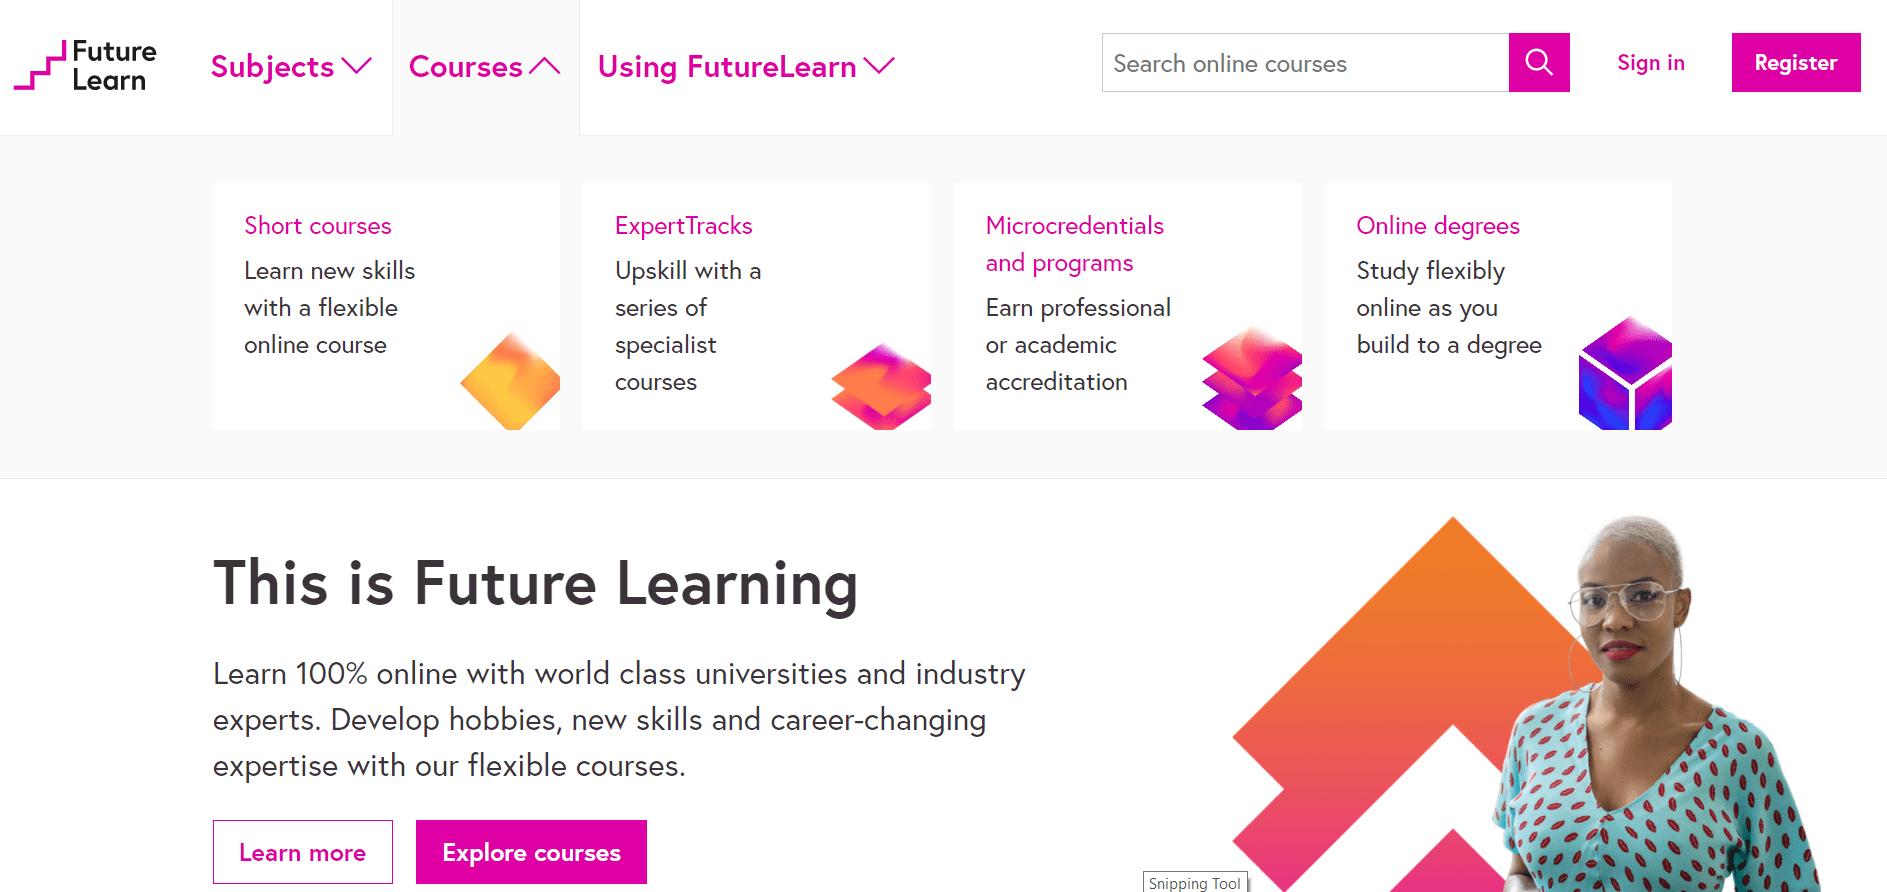 FutureLearn review